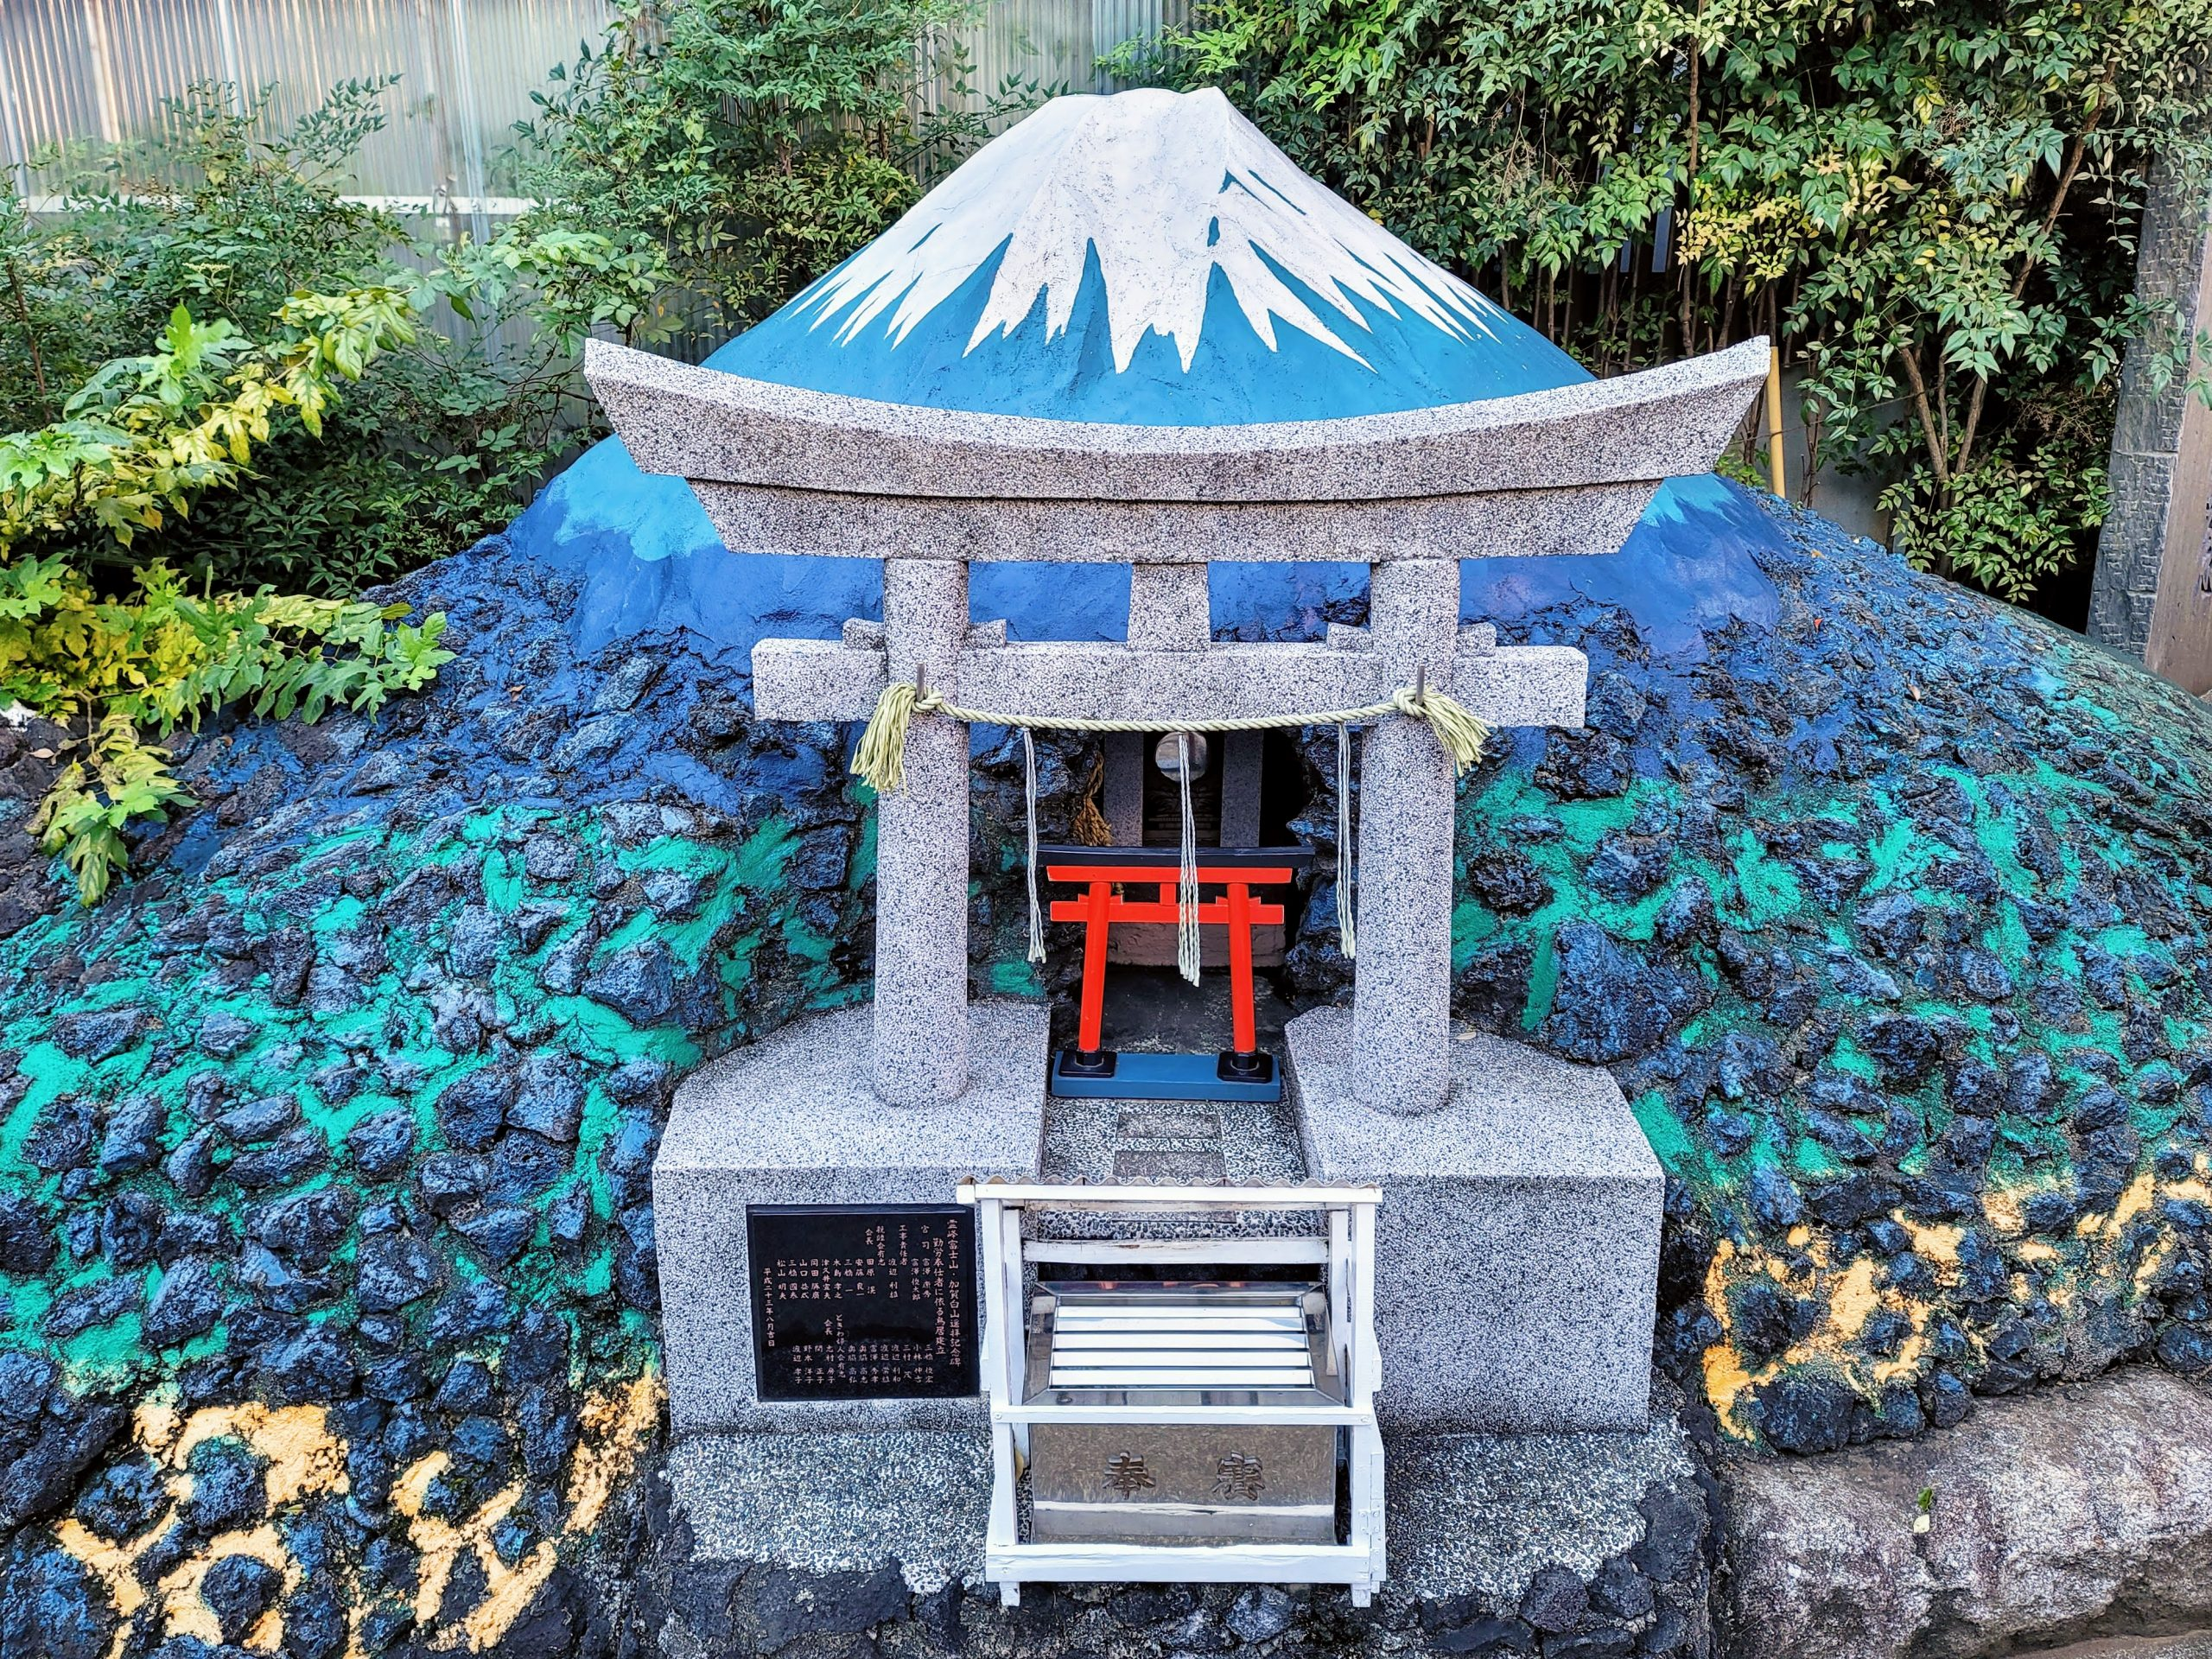 Fuji Asama shrine at Keihin Inari Shrine in Musashi Kosugi